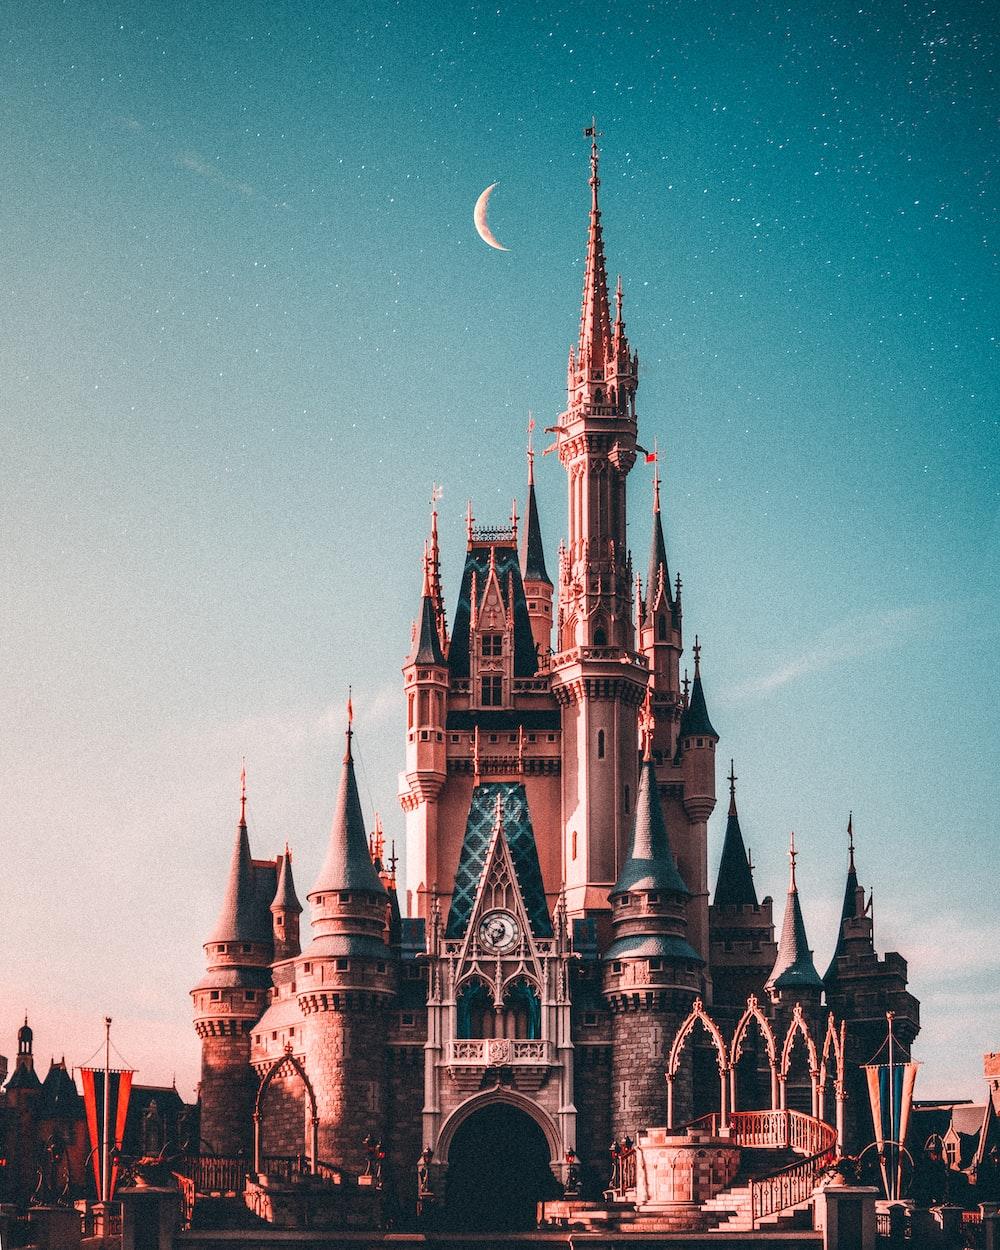 blue and beige Disneyland castle